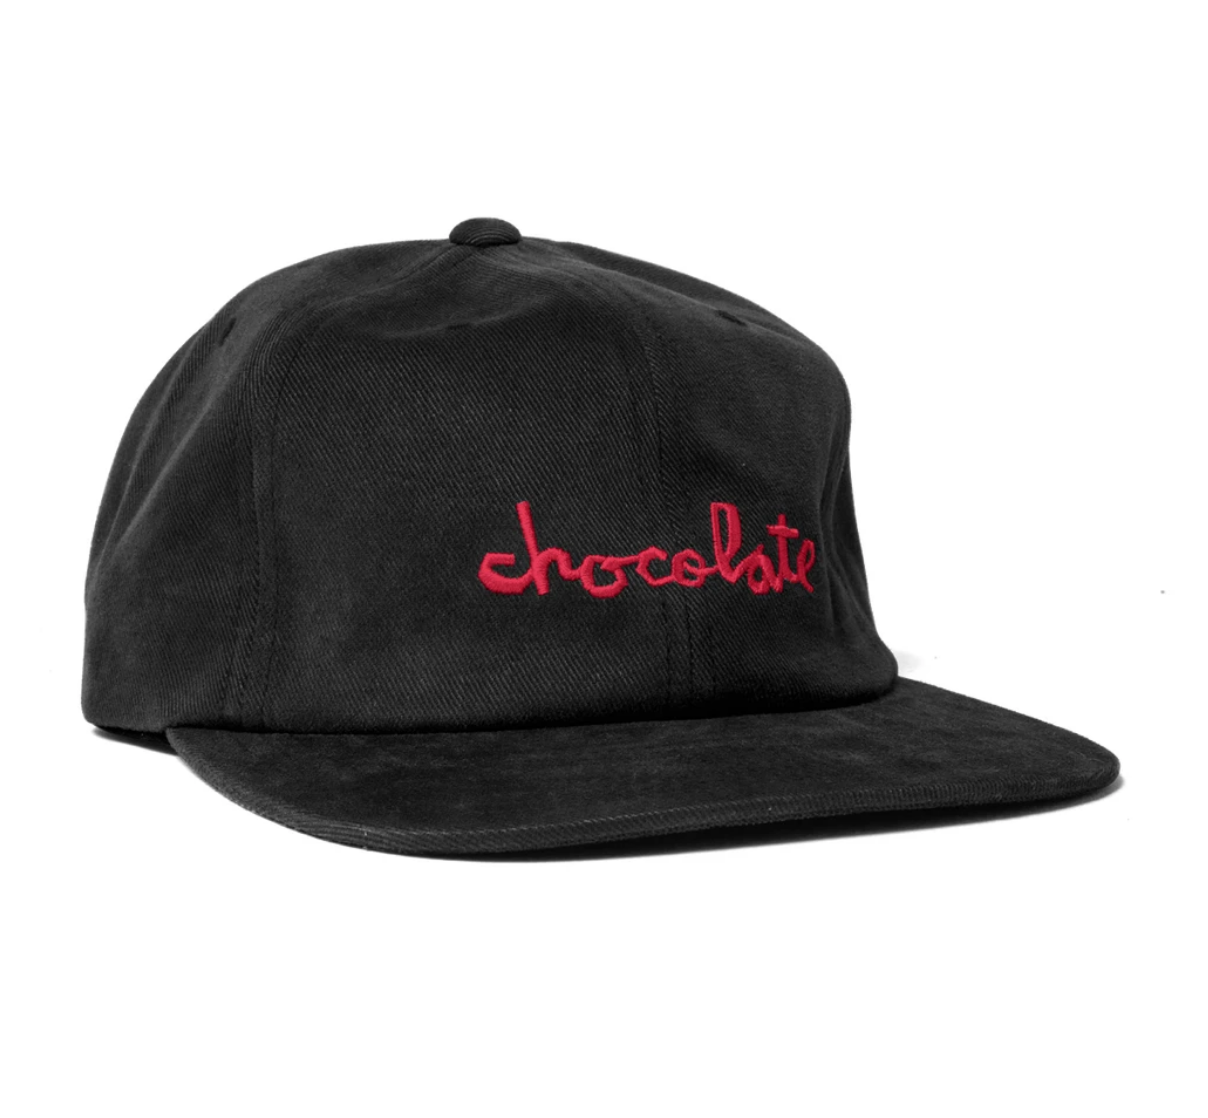 Chocolate Skateboards OG Chunk Strapback Black